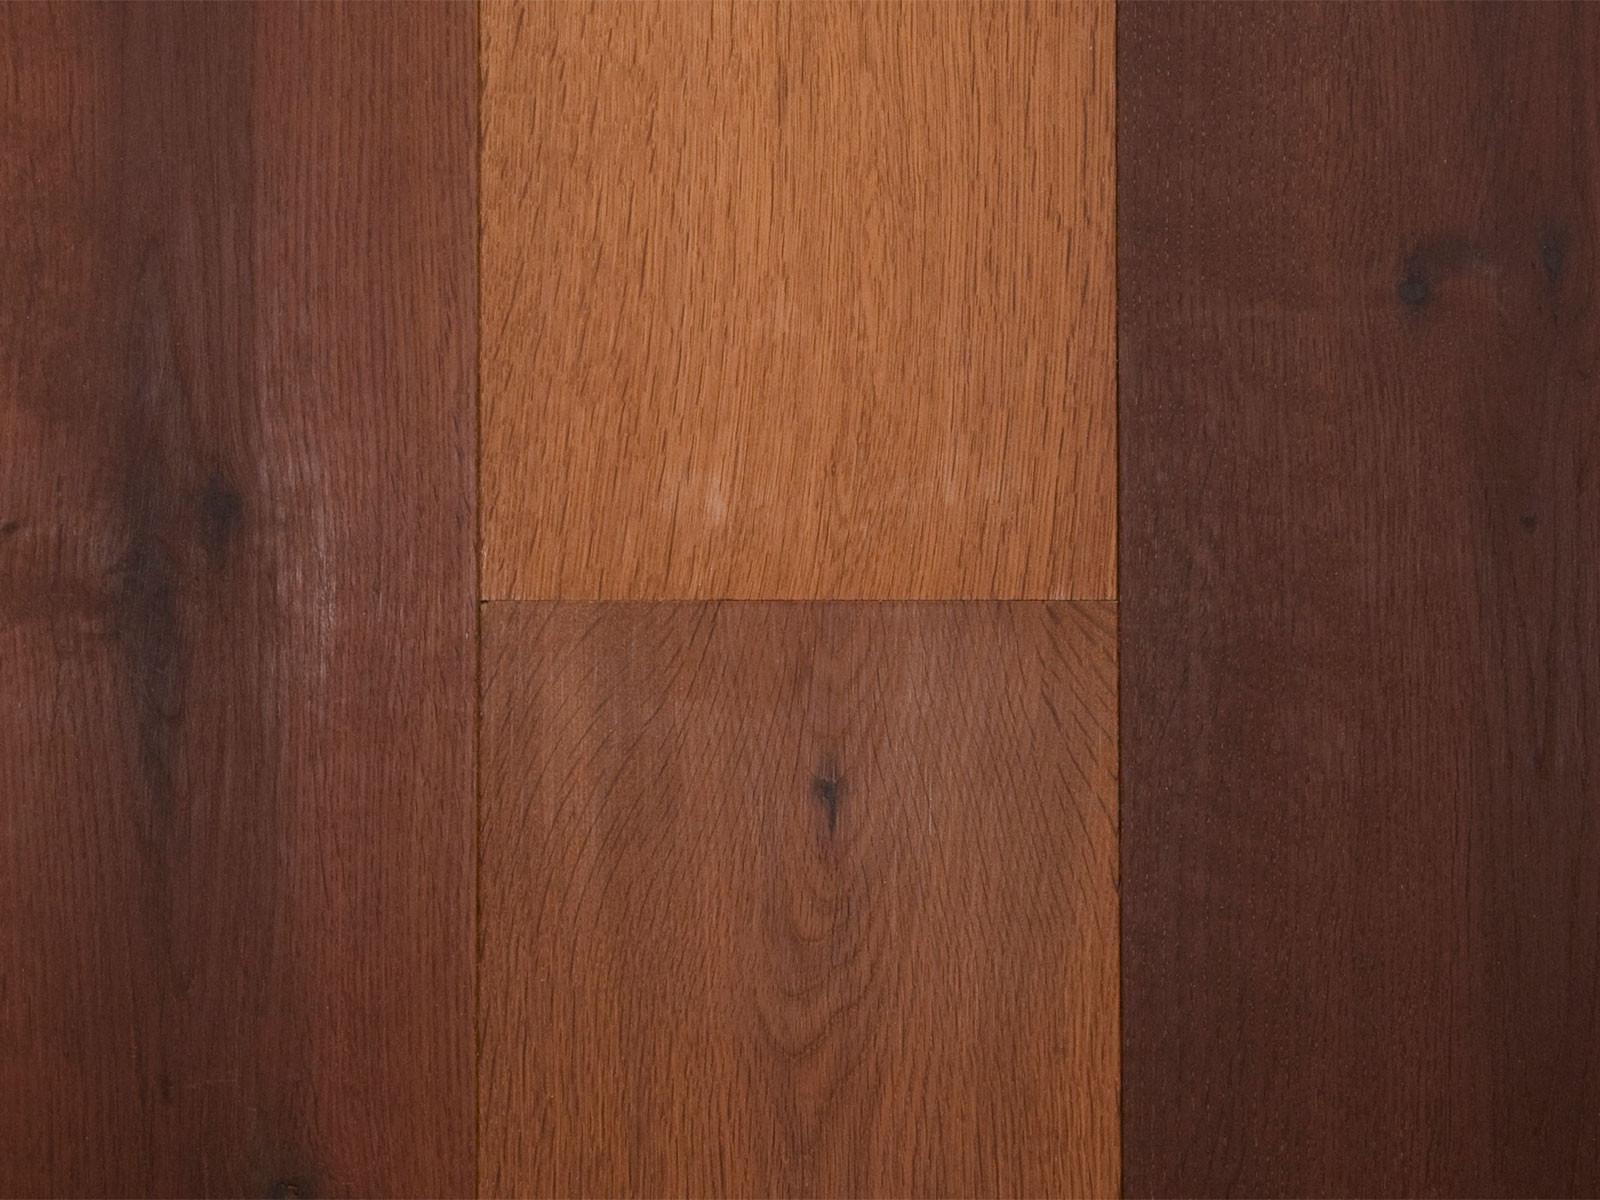 hardwood floor supply dallas of duchateau hardwood flooring houston tx discount engineered wood in savoy european oak